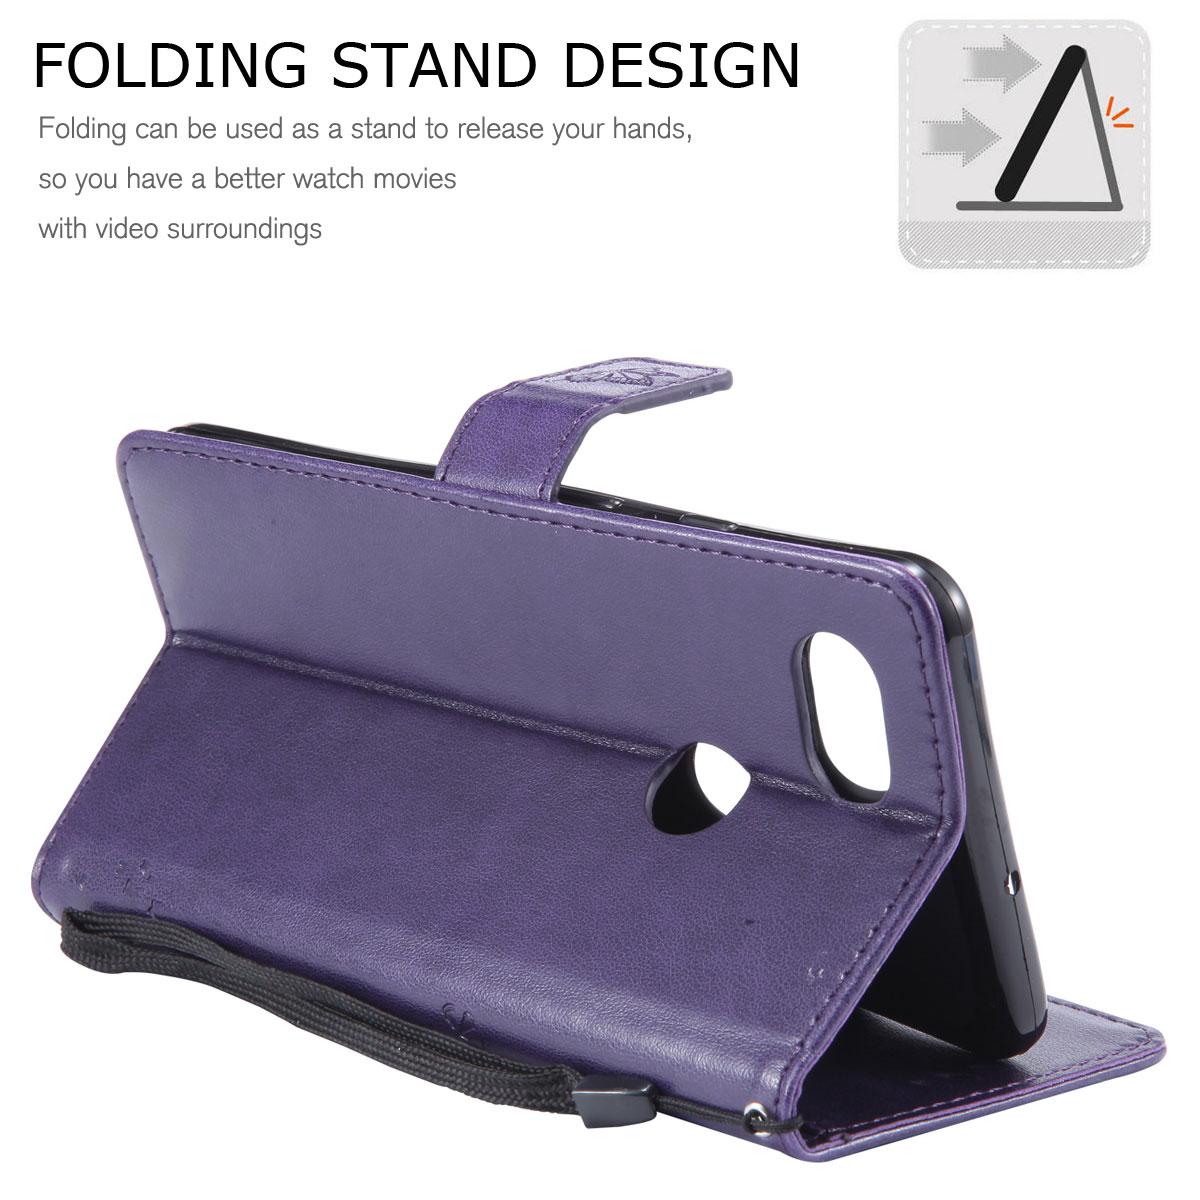 Magnetic-Leather-Credit-Card-Holder-Flip-Case-Cover-For-Google-Pixel-2-2-XL thumbnail 71